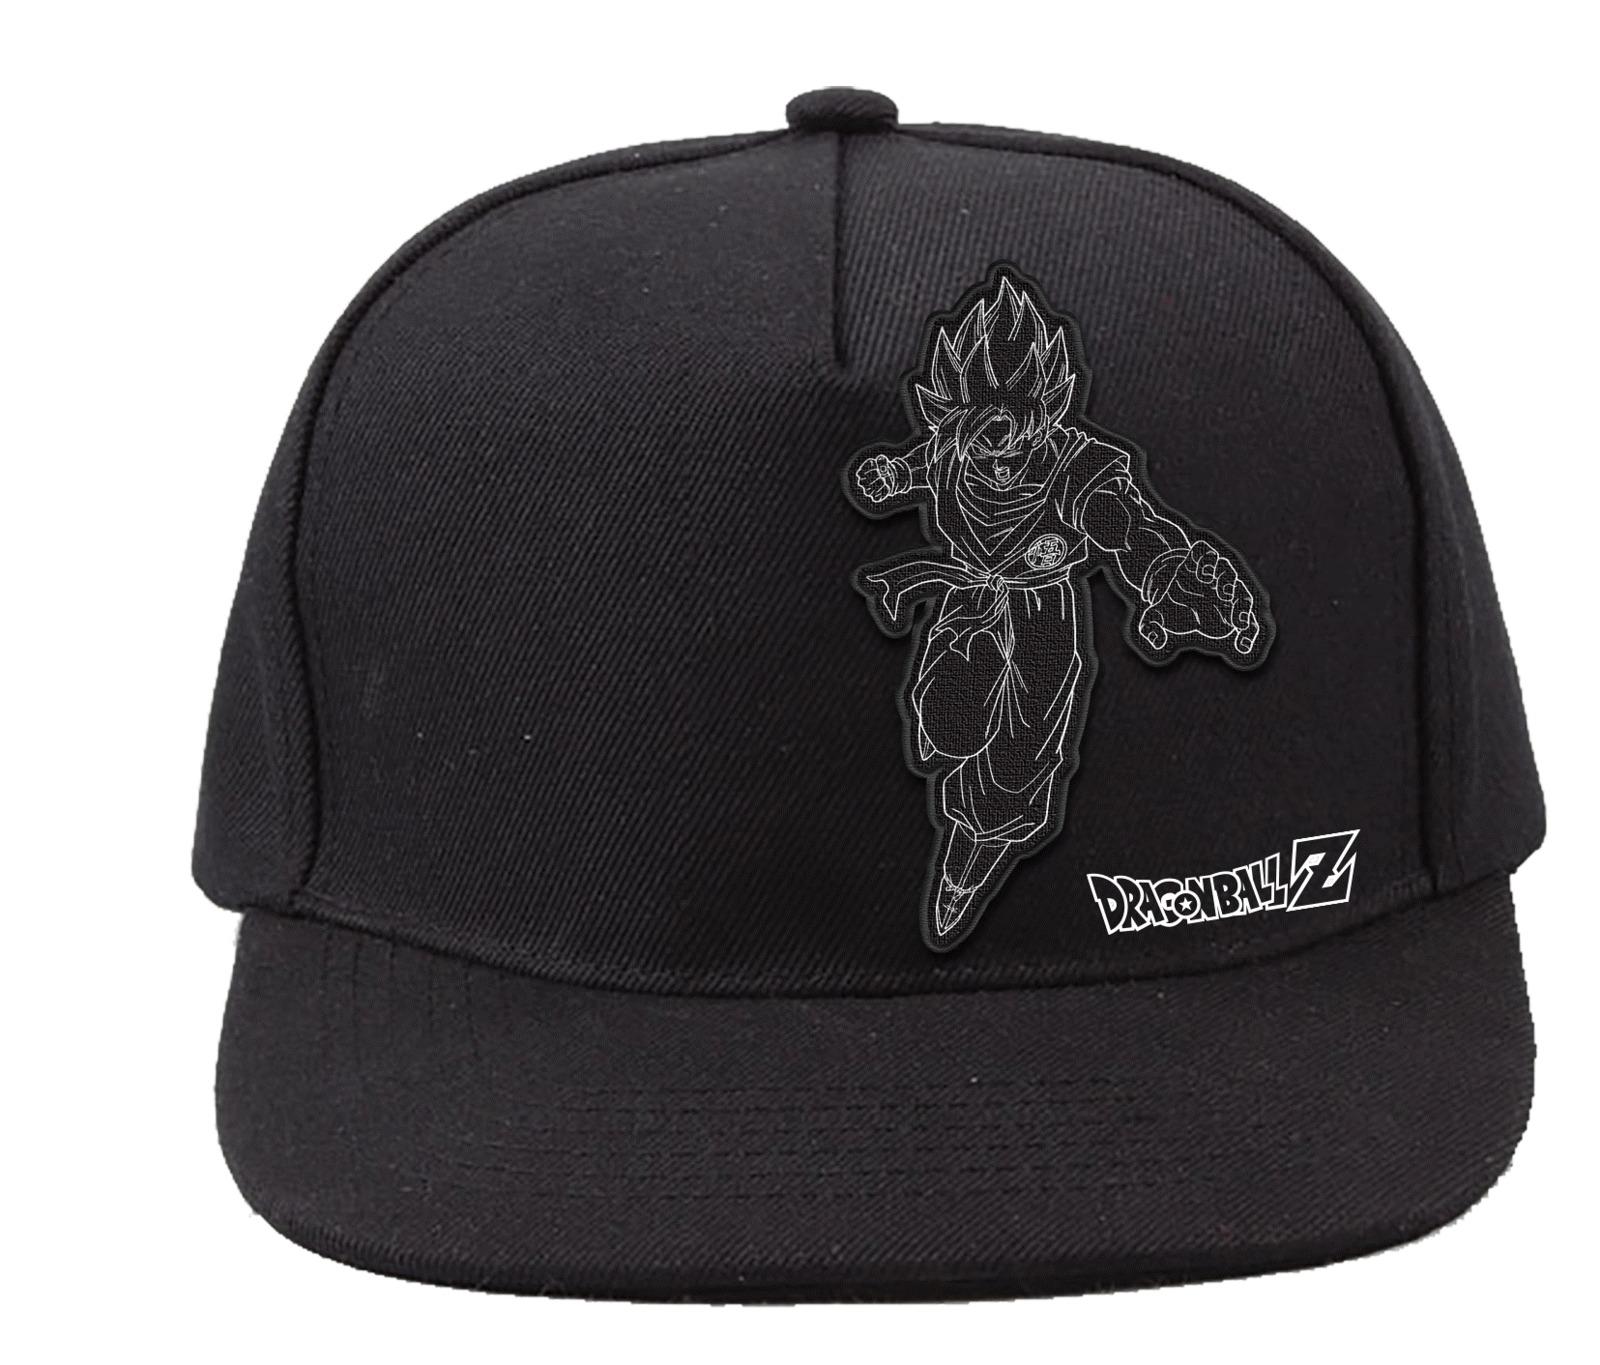 DBZ Goku Black Cap image